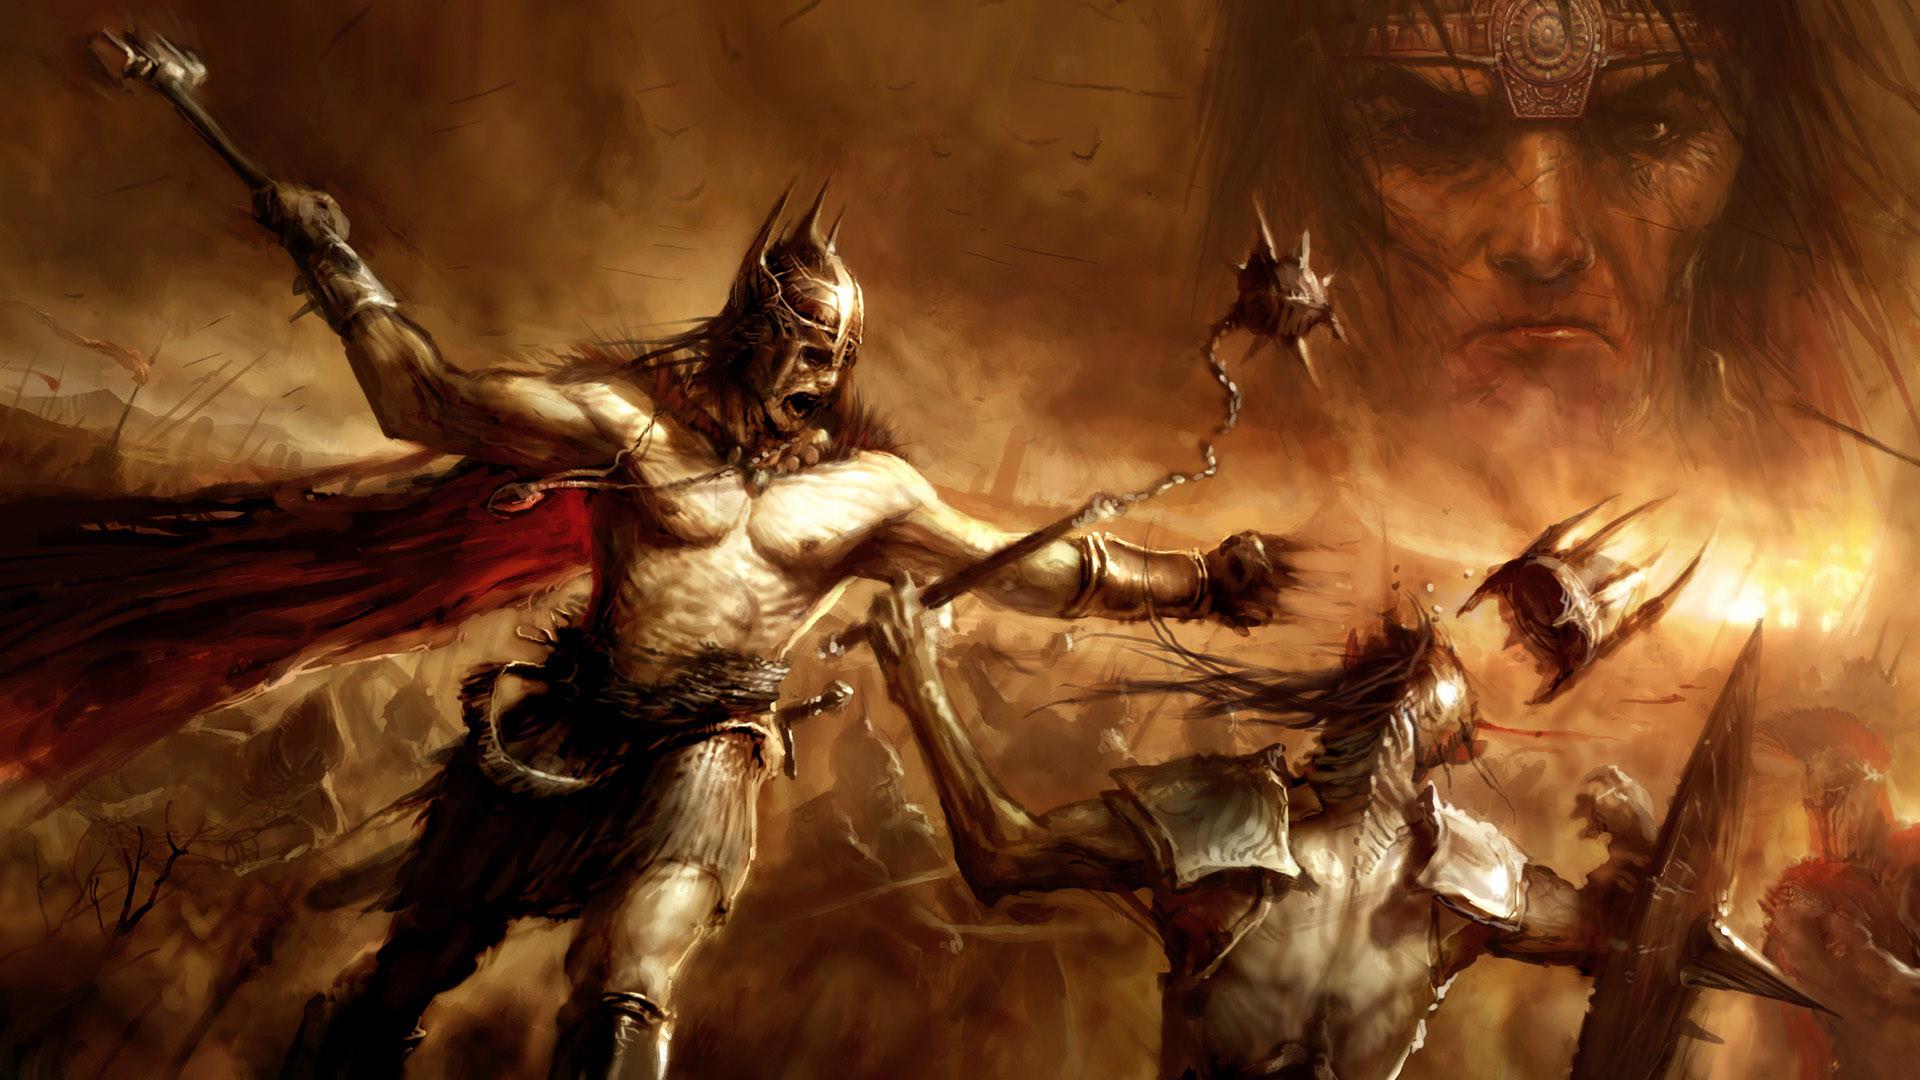 Conan The Barbarian Wallpaper 75 Images